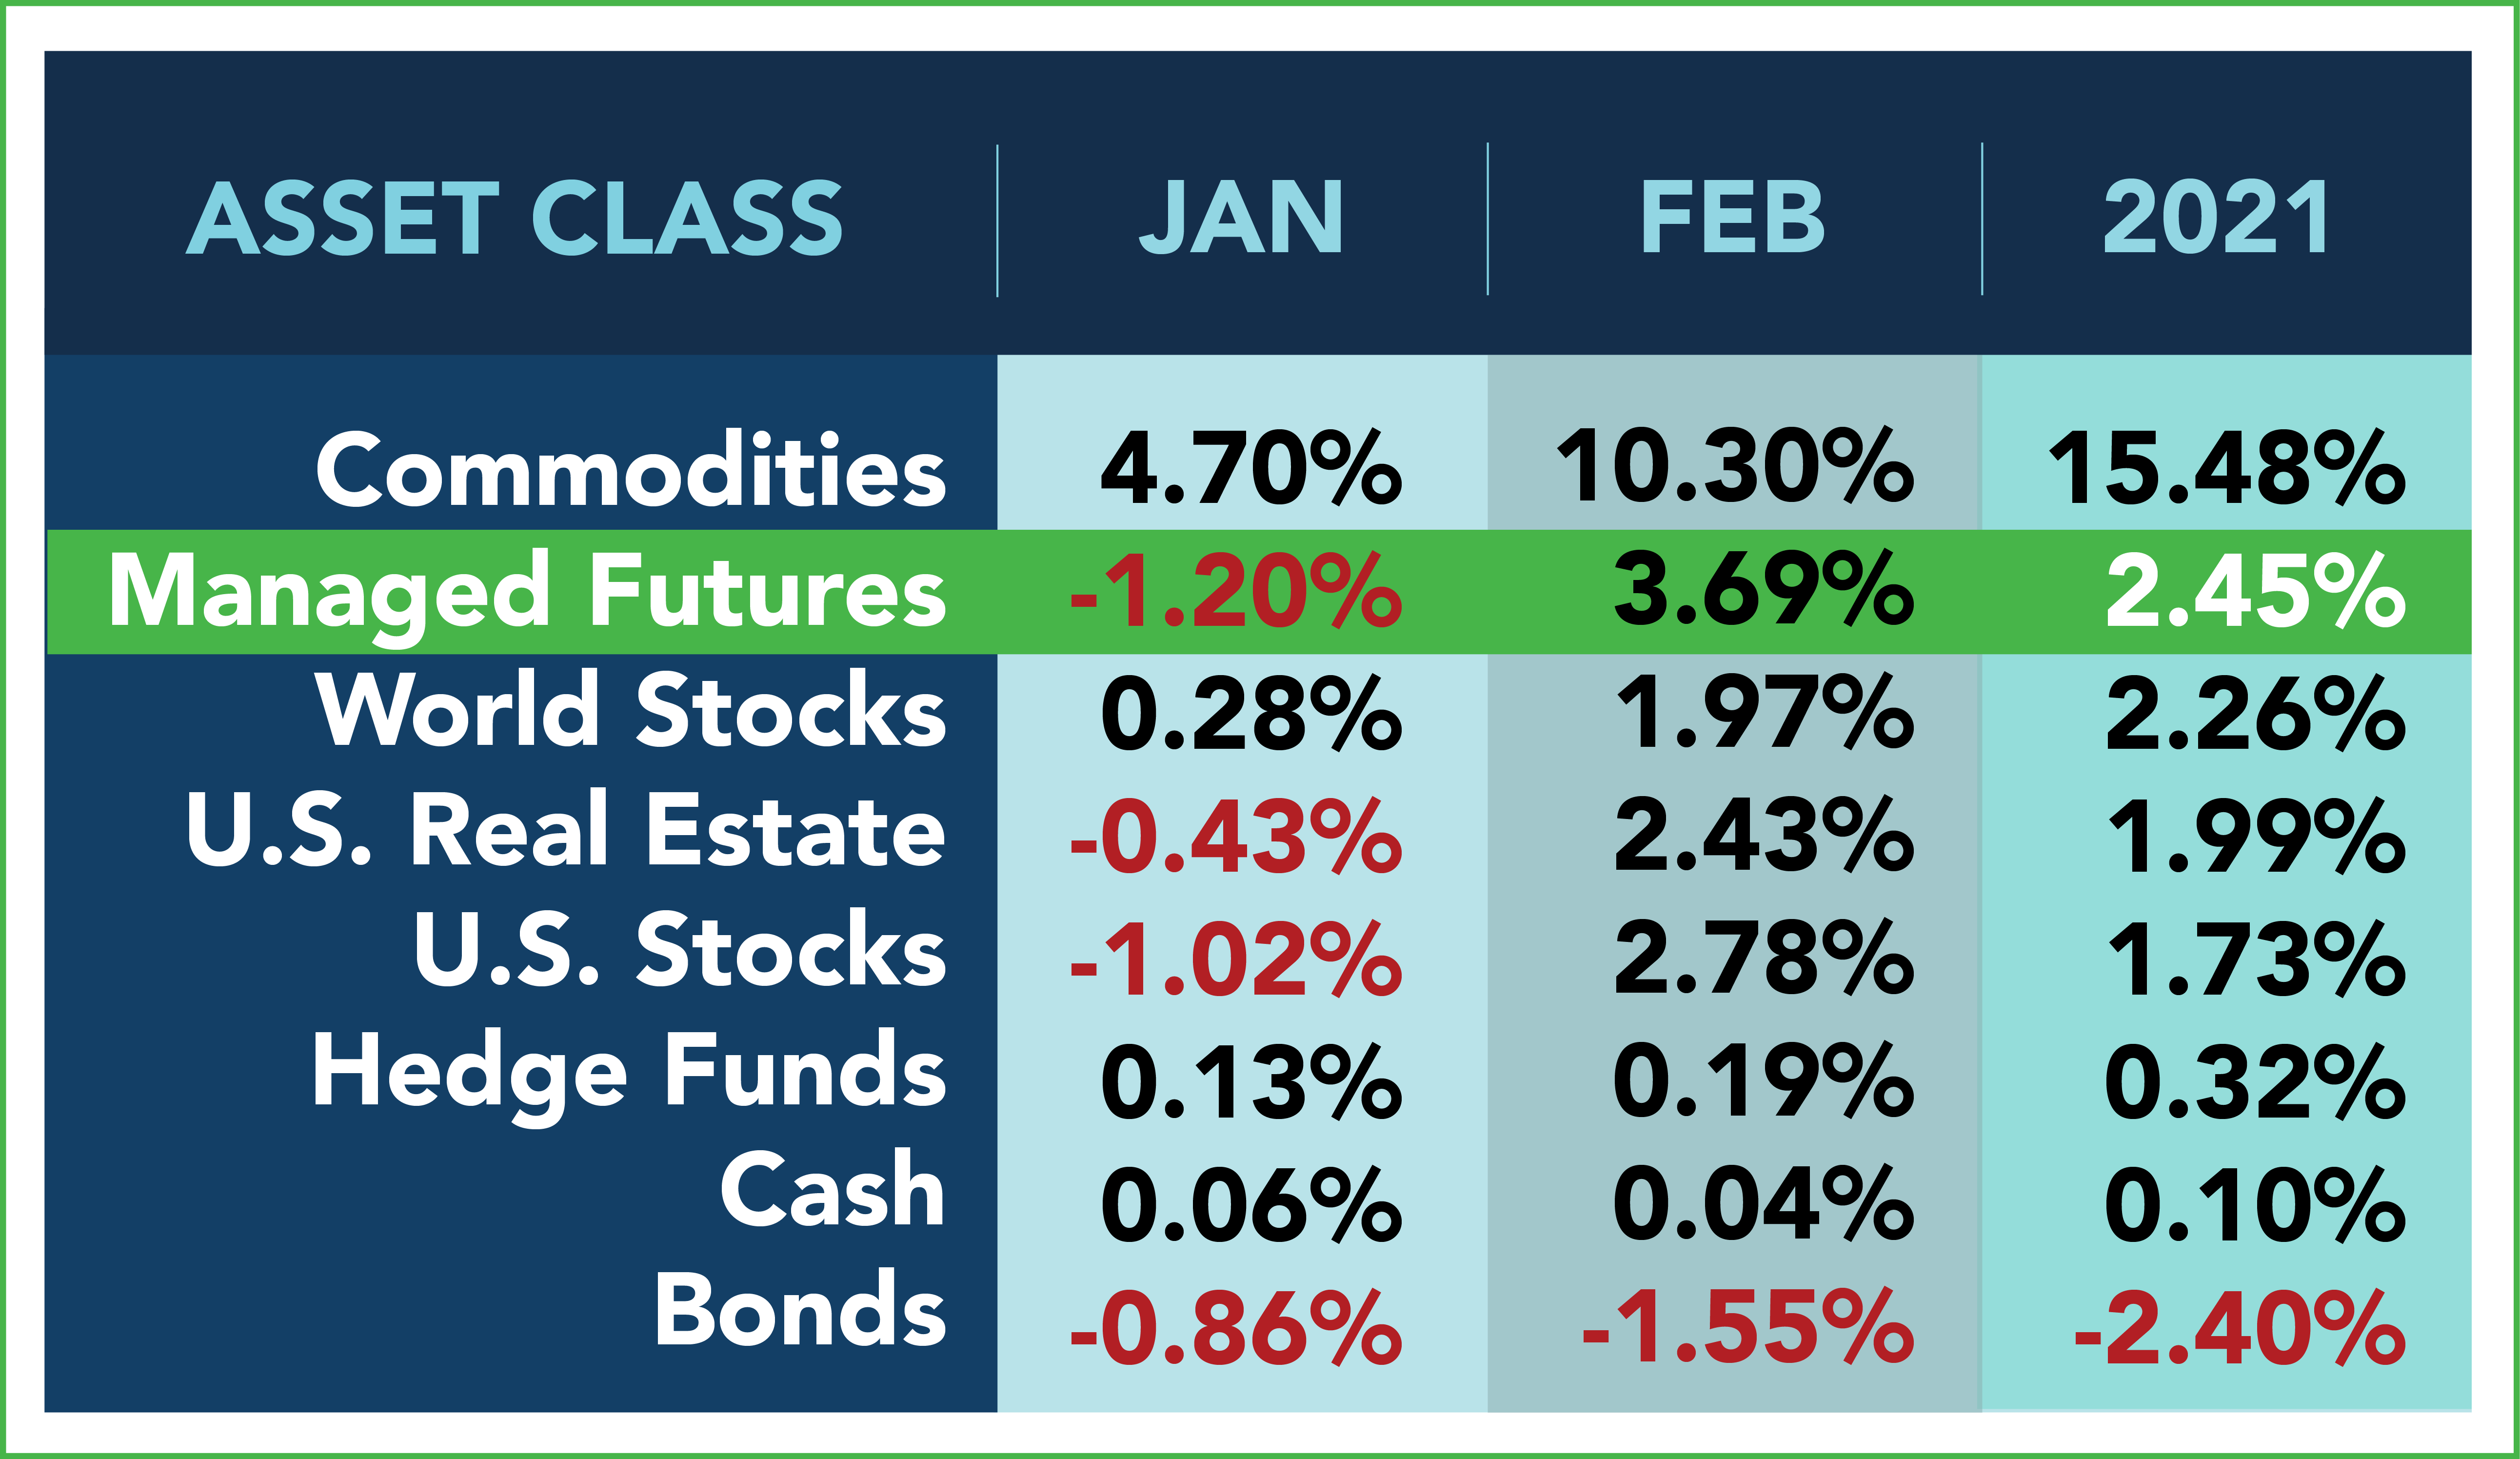 Asset Class Scoreboard: February 2021